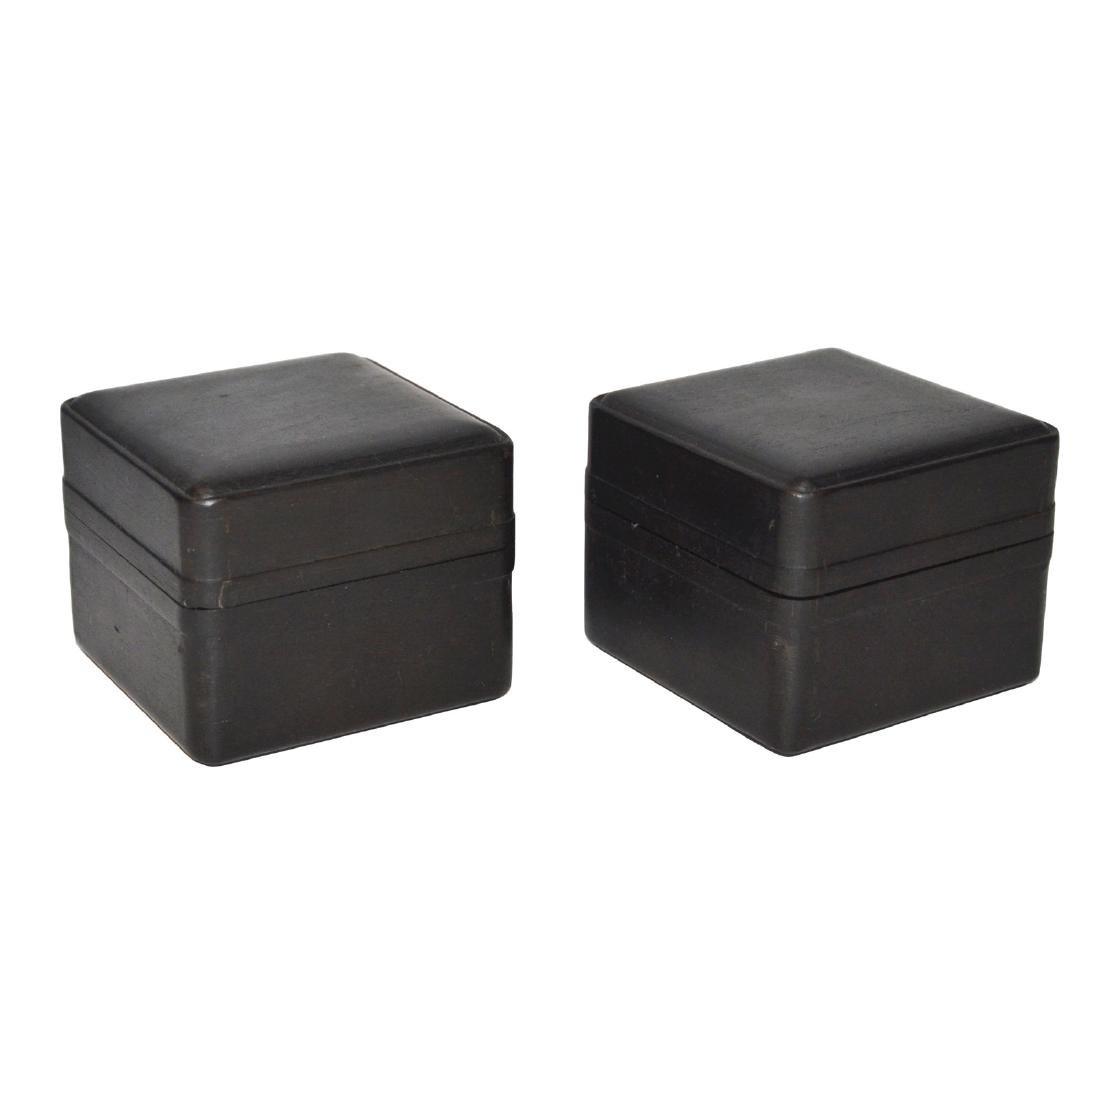 Qing, A Pair of Small Zitan Square Box